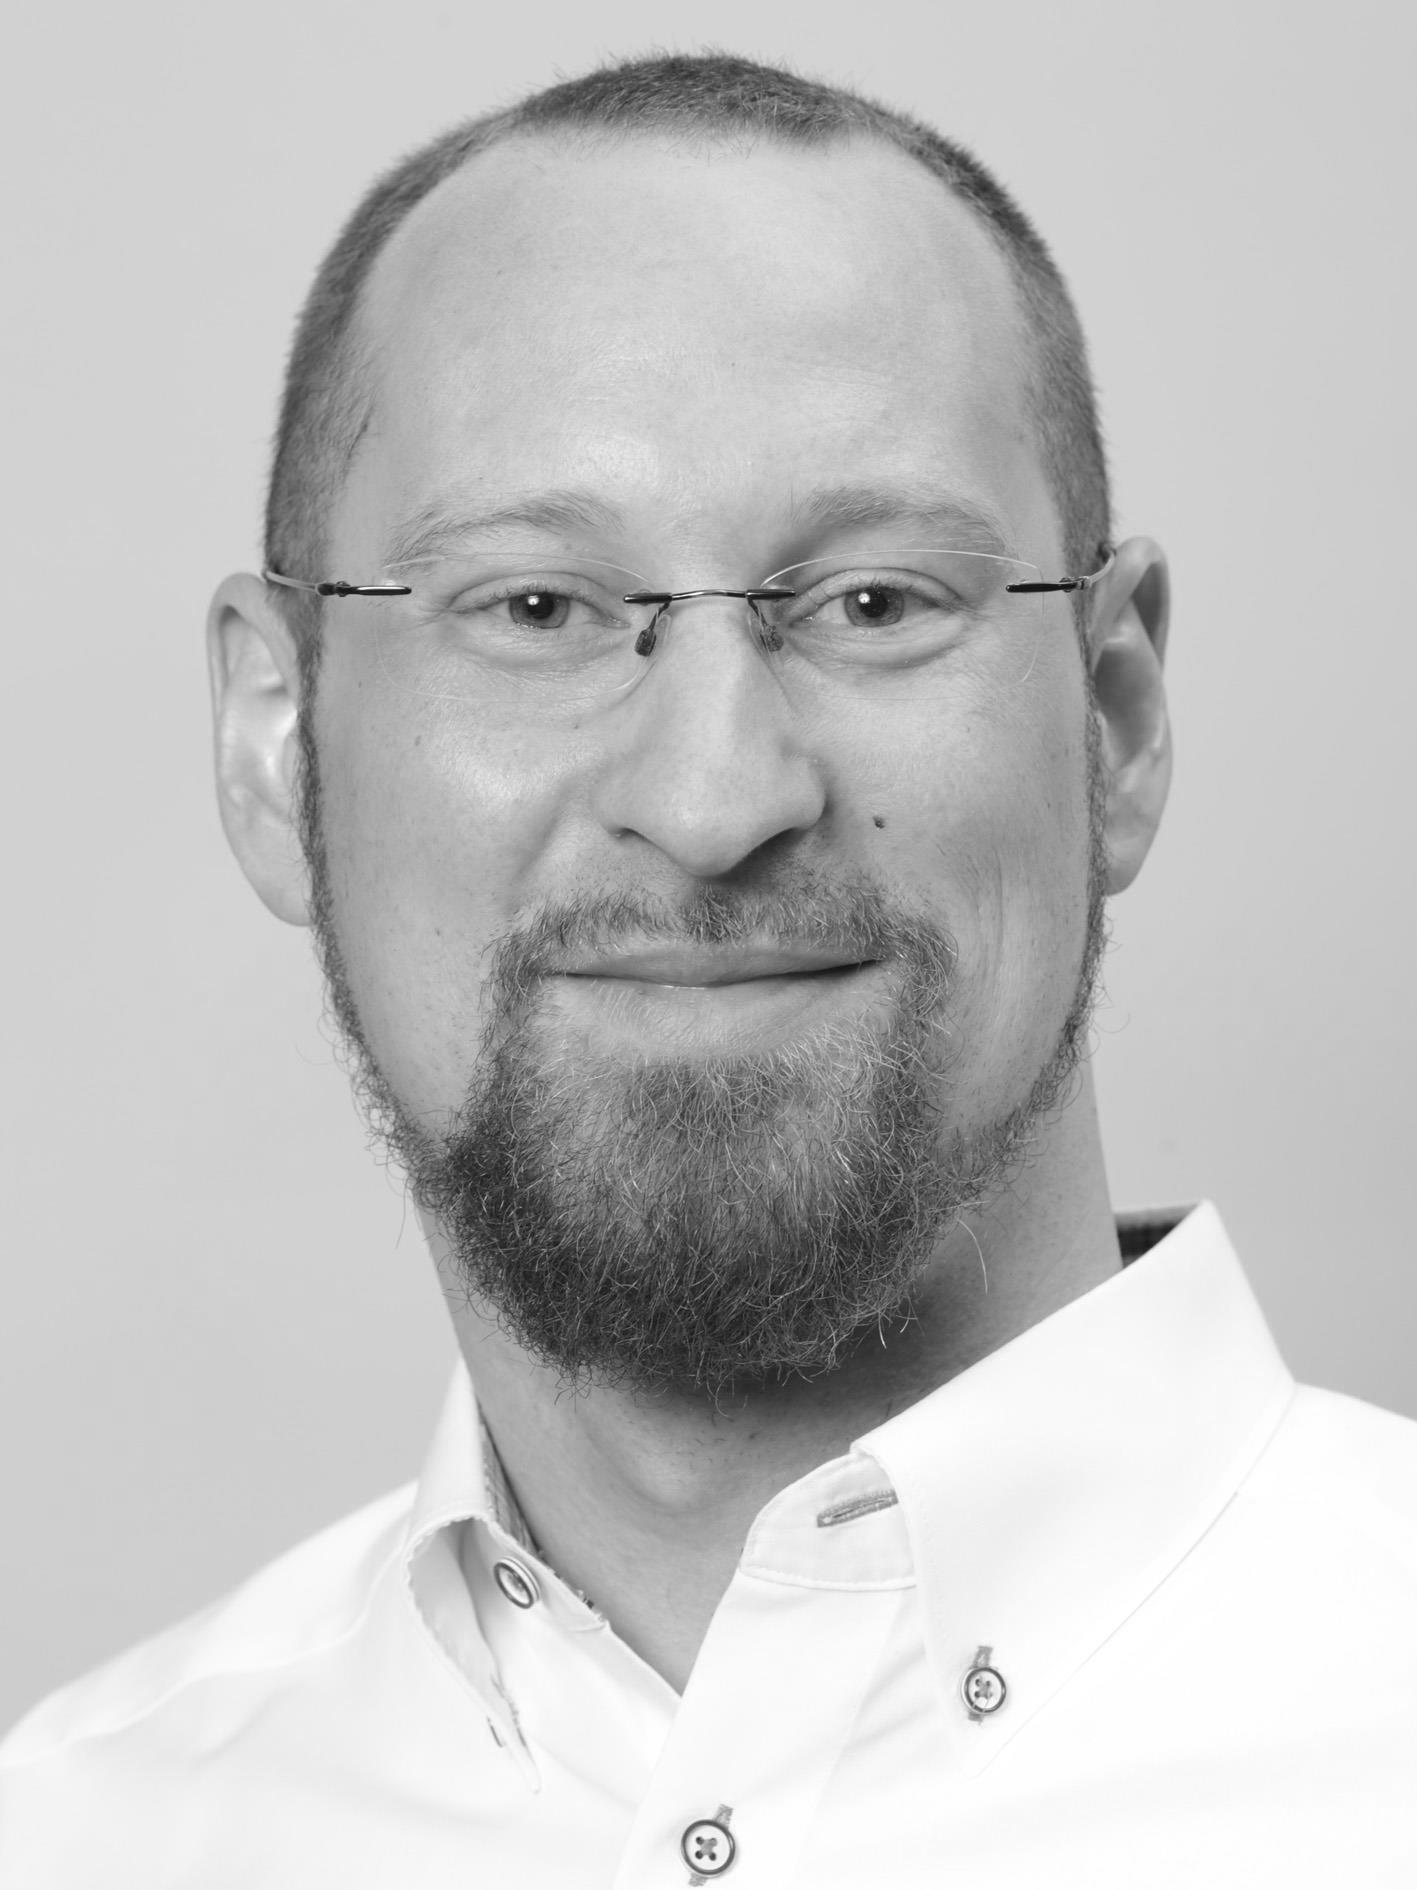 Lars Nellessen